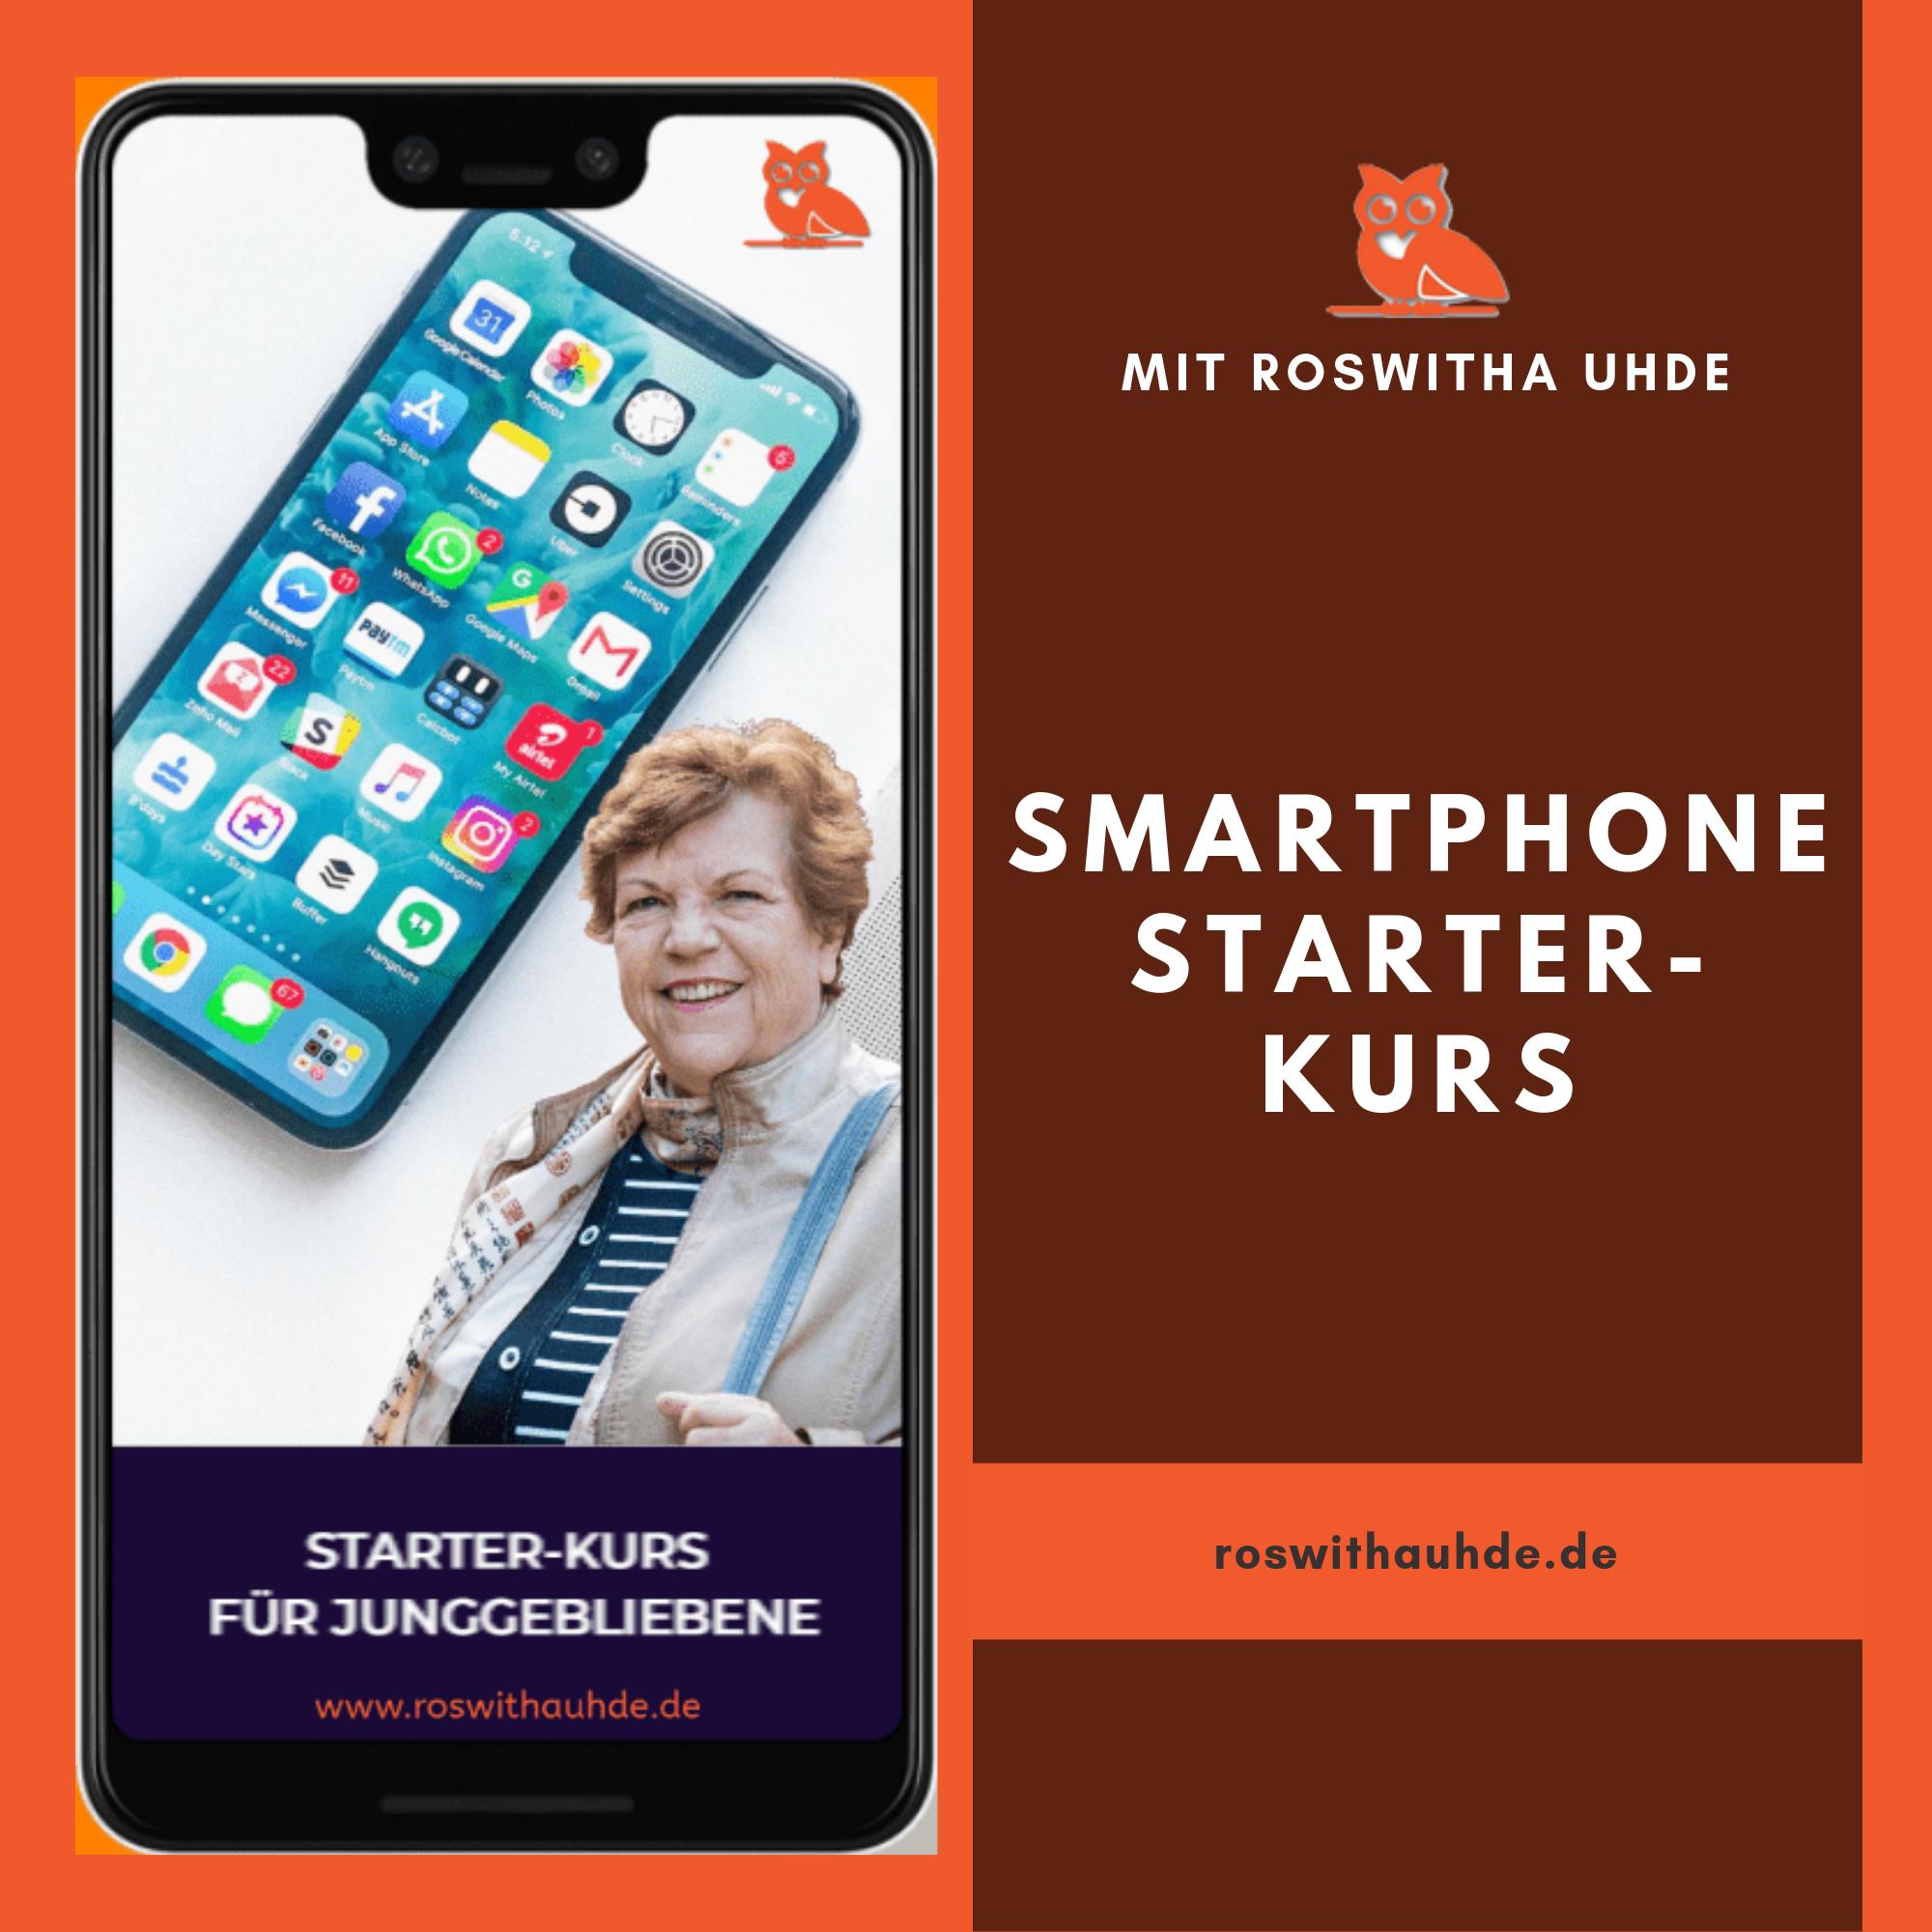 Smartphone-Starter-Kurs - Lernkurse